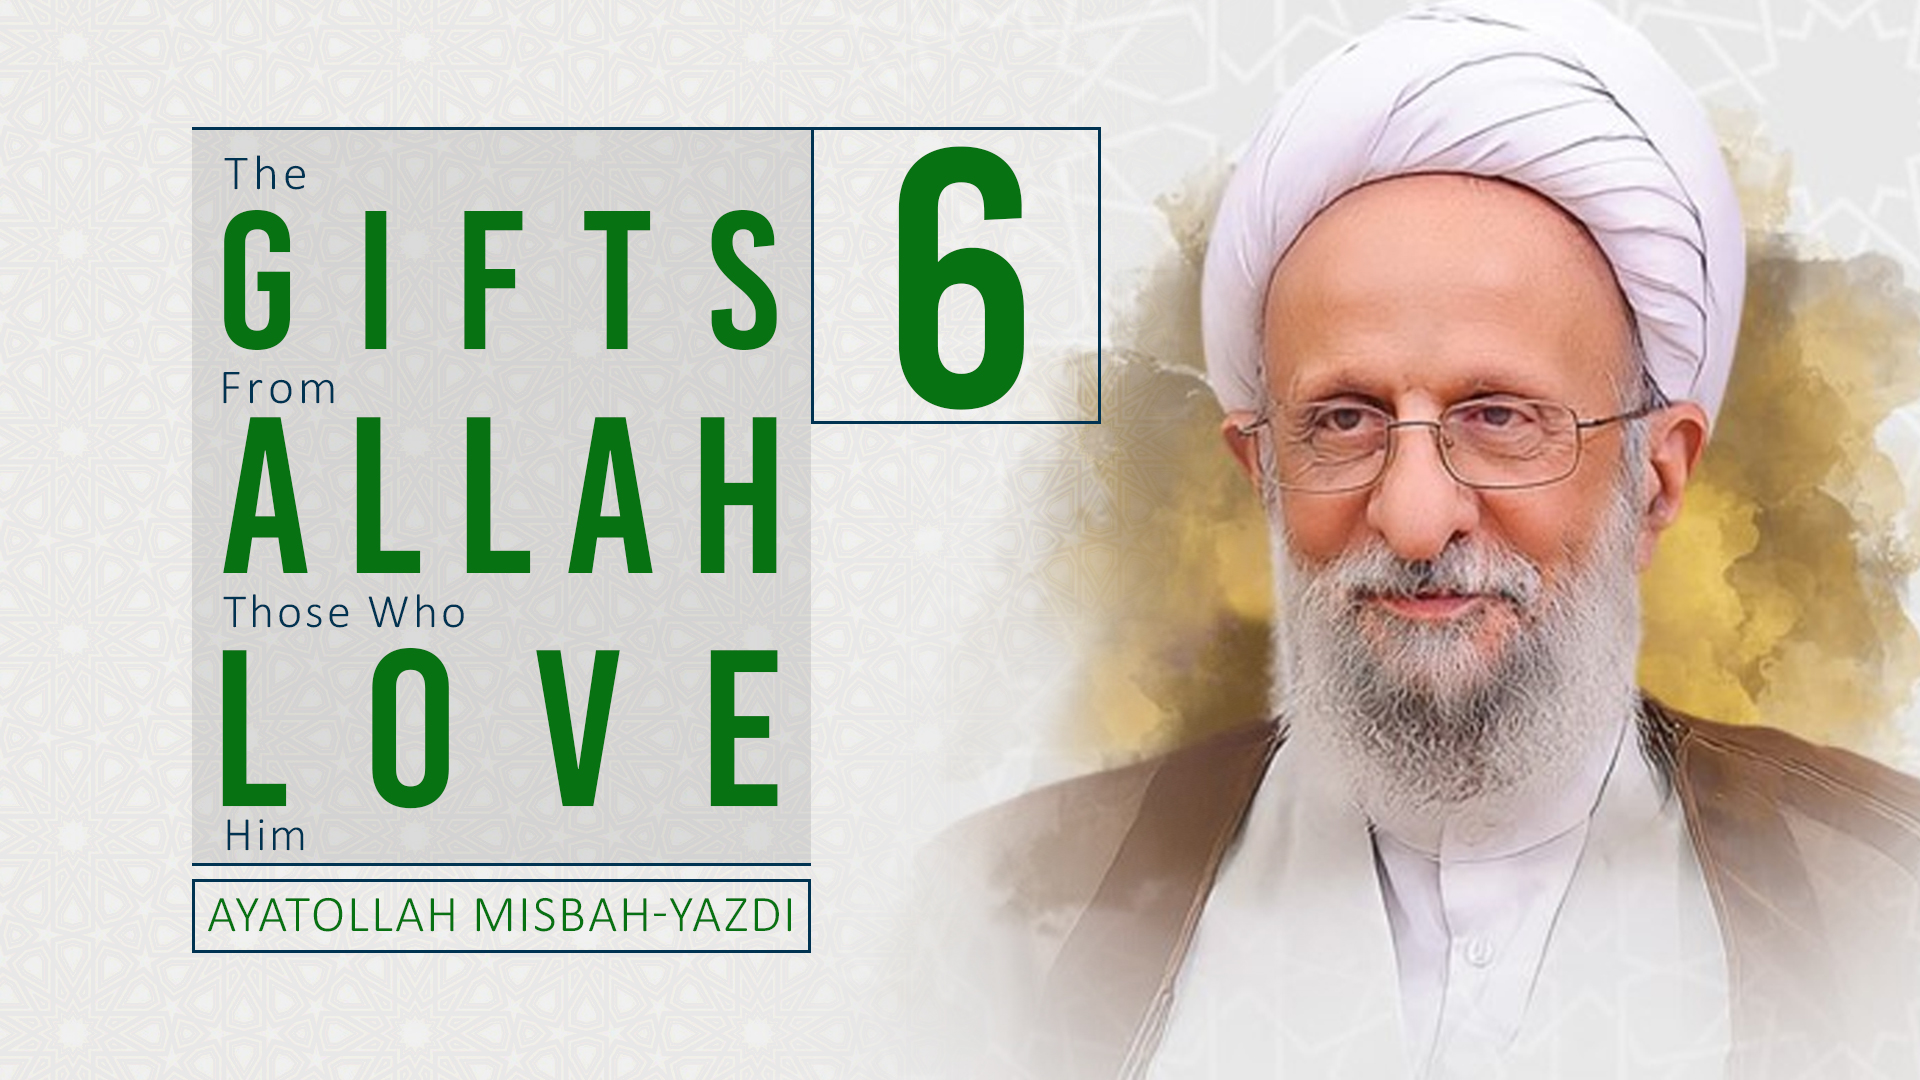 [6] The Gifts from Allah to Those Who Love Him | Ayatollah Misbah-Yazdi | Farsi Sub English